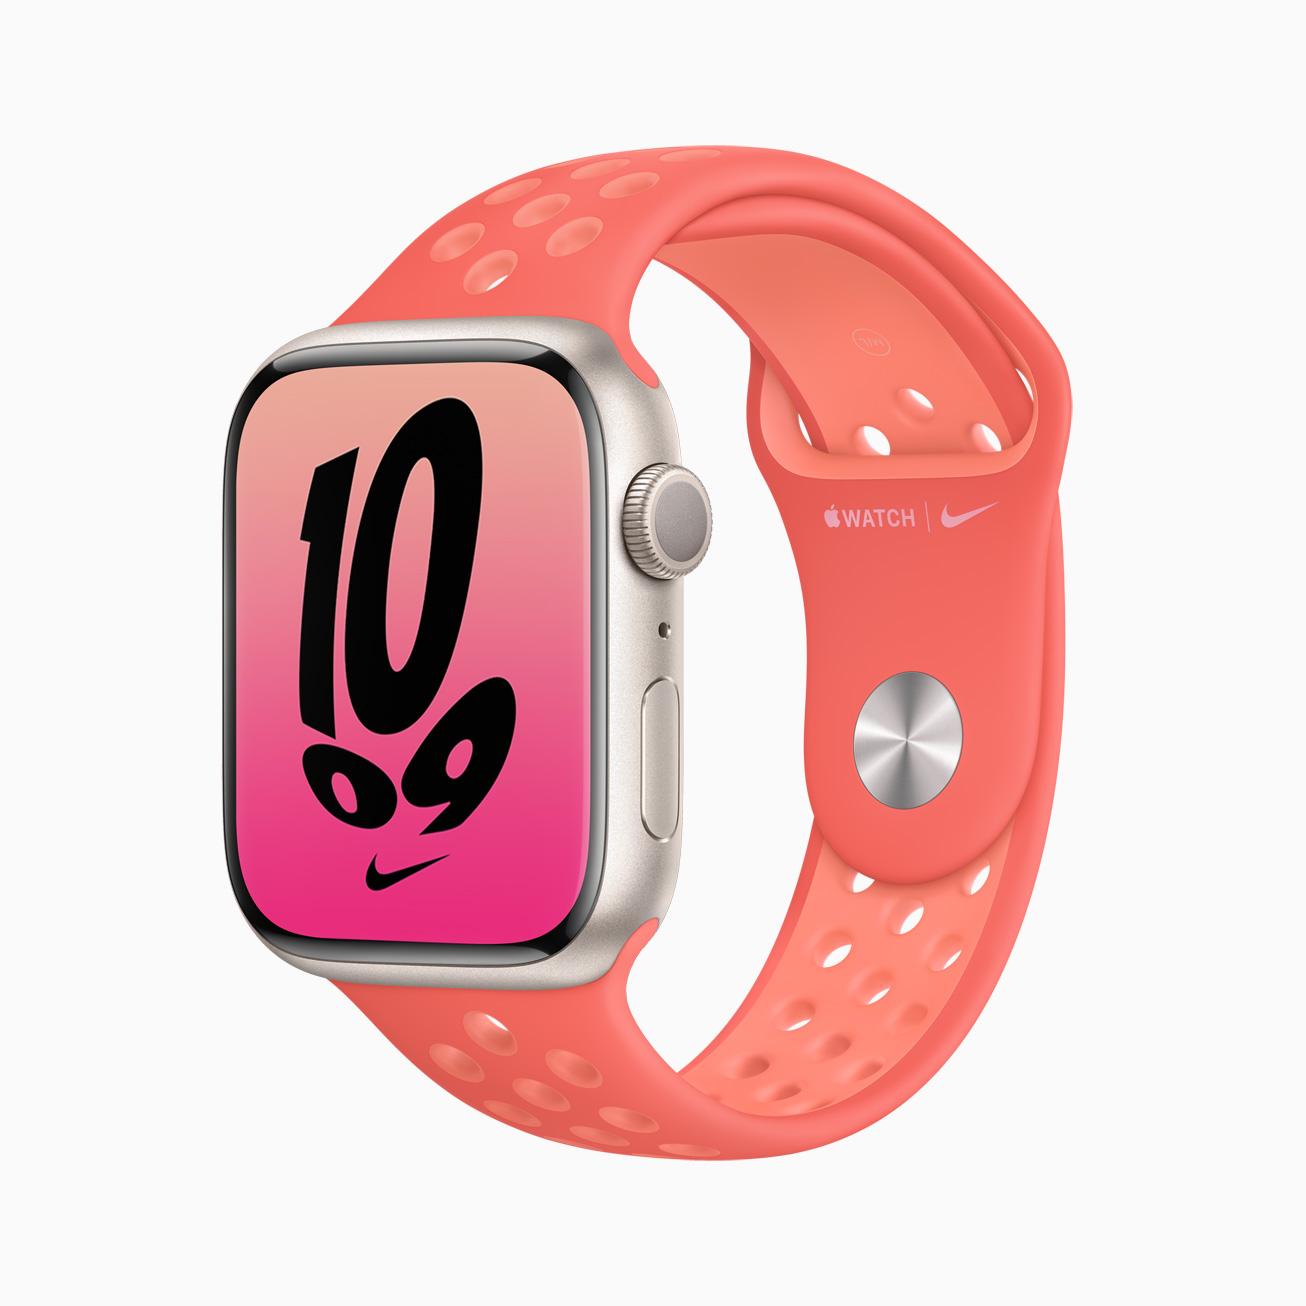 ontop.vn Apple watch series7 nike 02 09142021